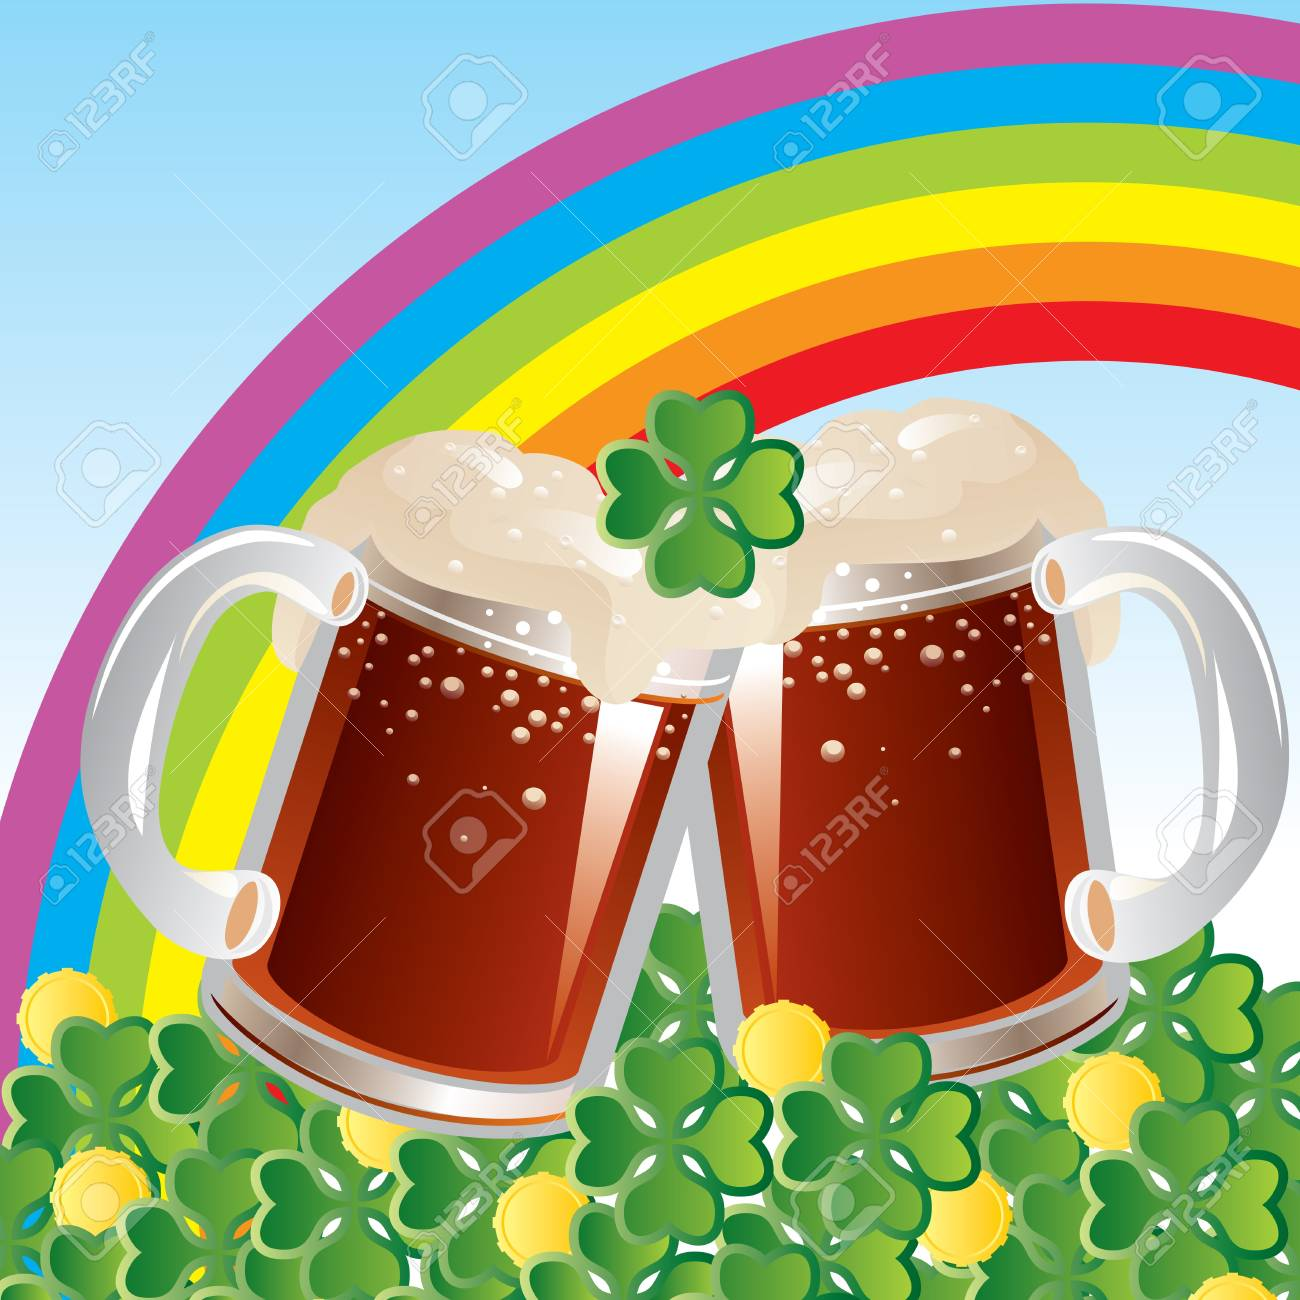 St  Patricks Day celebration Stock Vector - 17362089